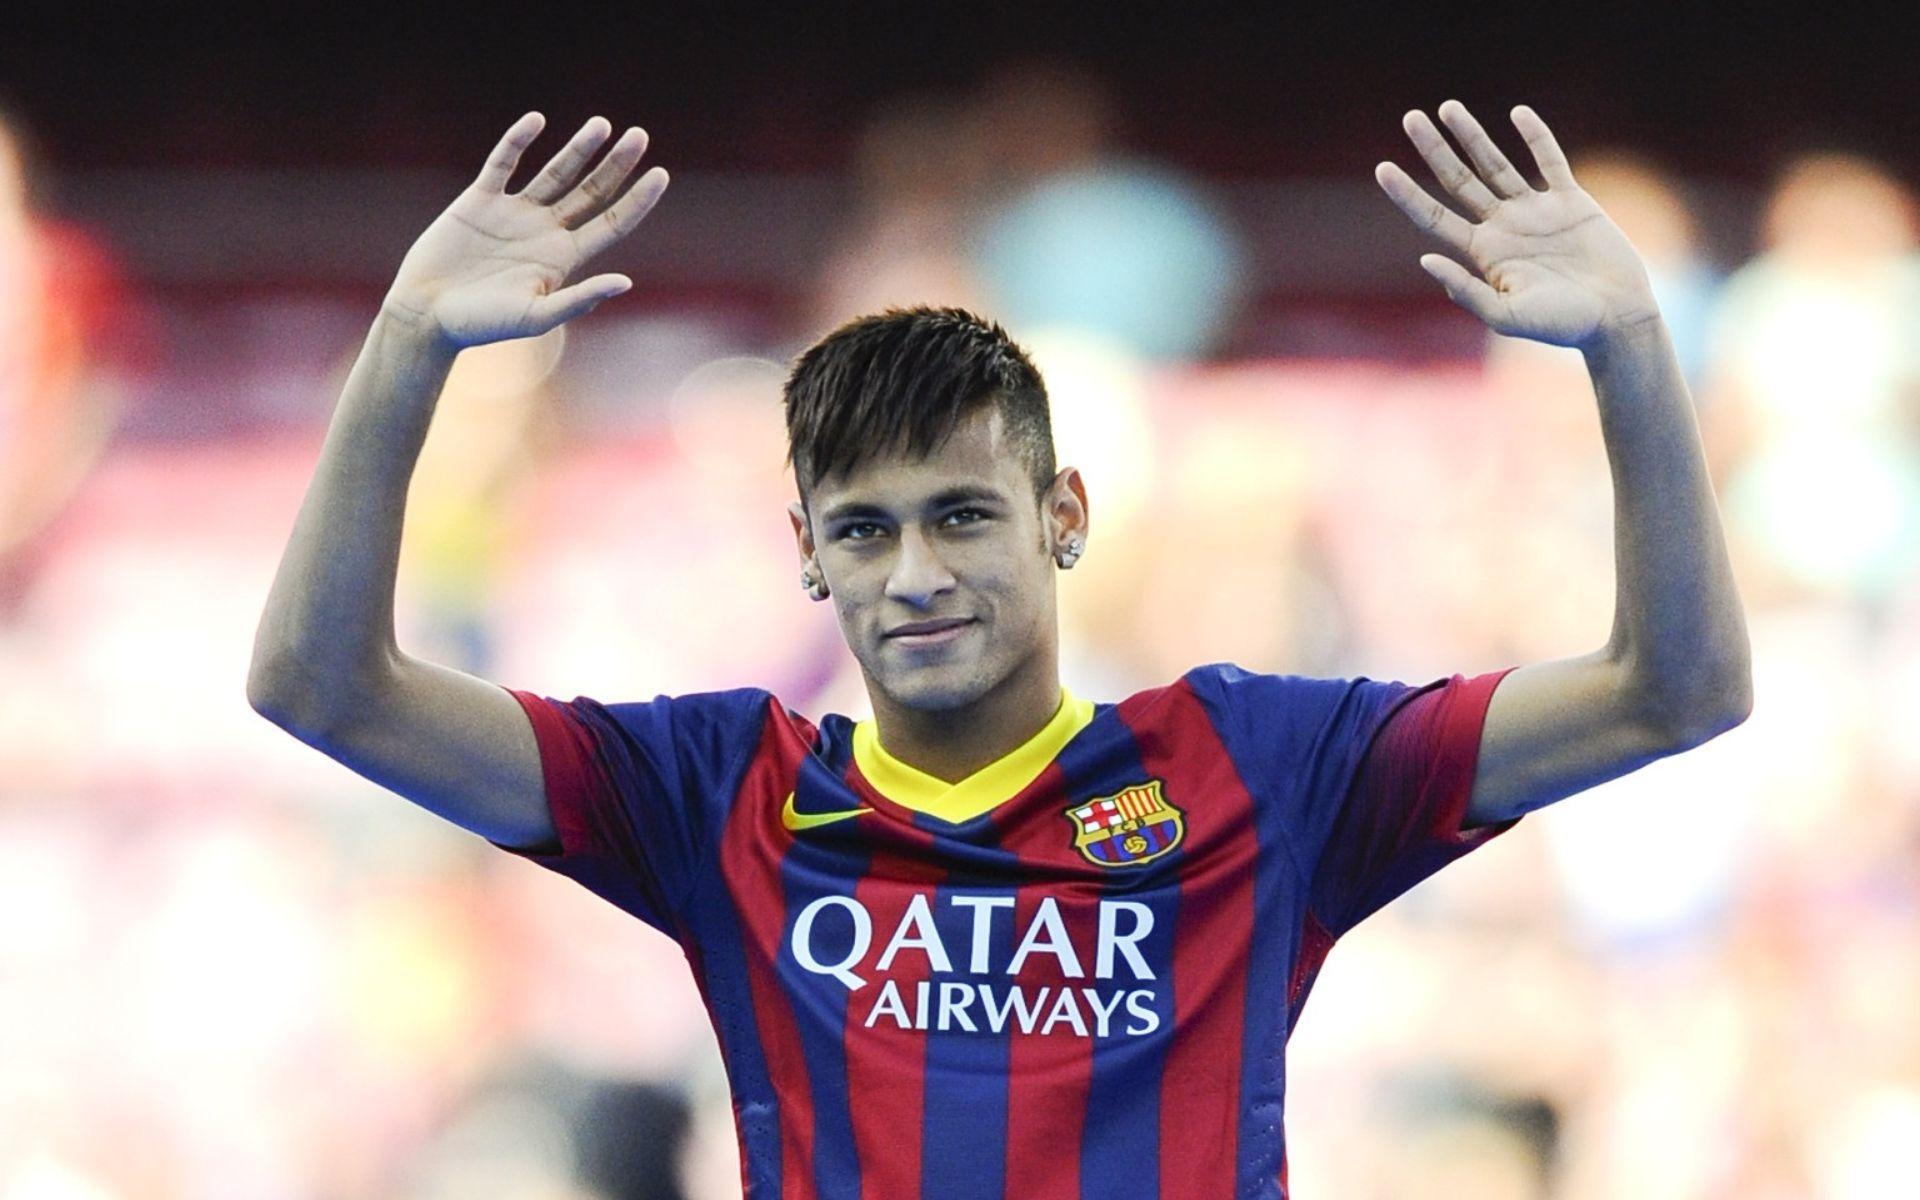 Hd wallpaper neymar - Neymar For Desktop